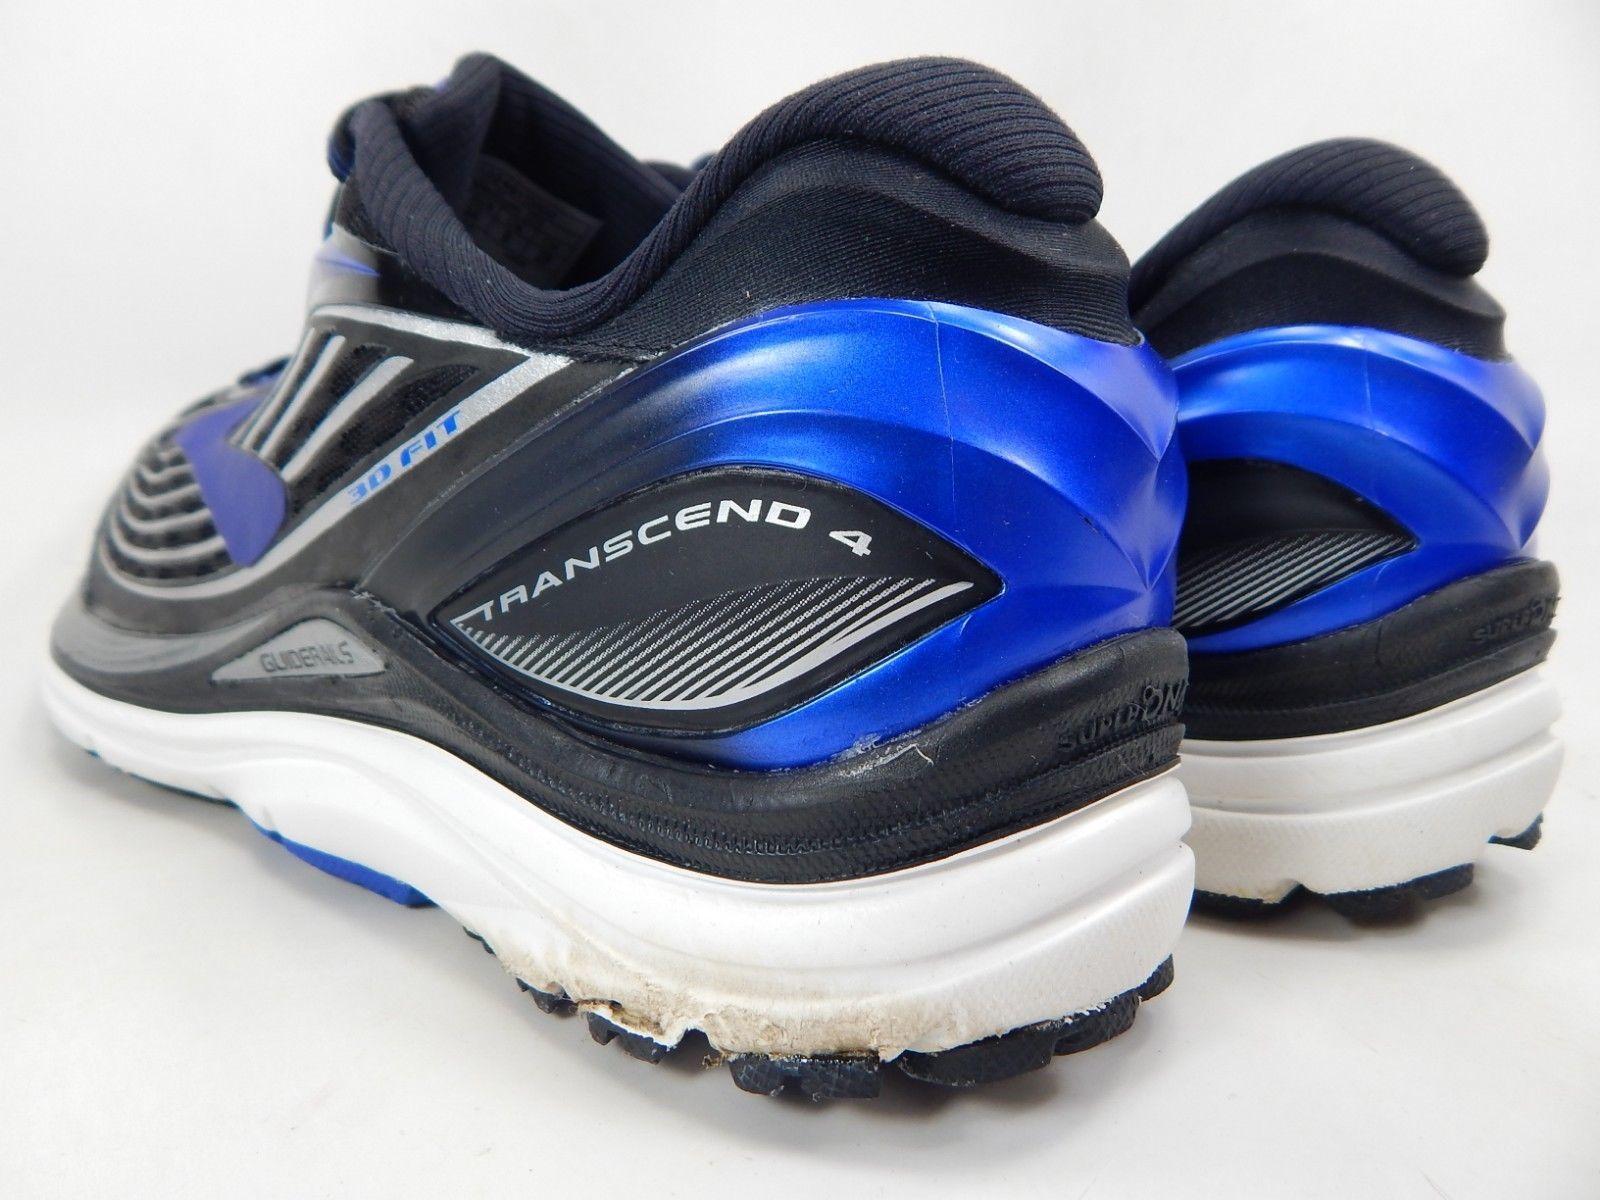 Brooks Transcend 4 Size US 10 M (D) EU 44 Men's Running Shoes Black 1102491D002 image 4